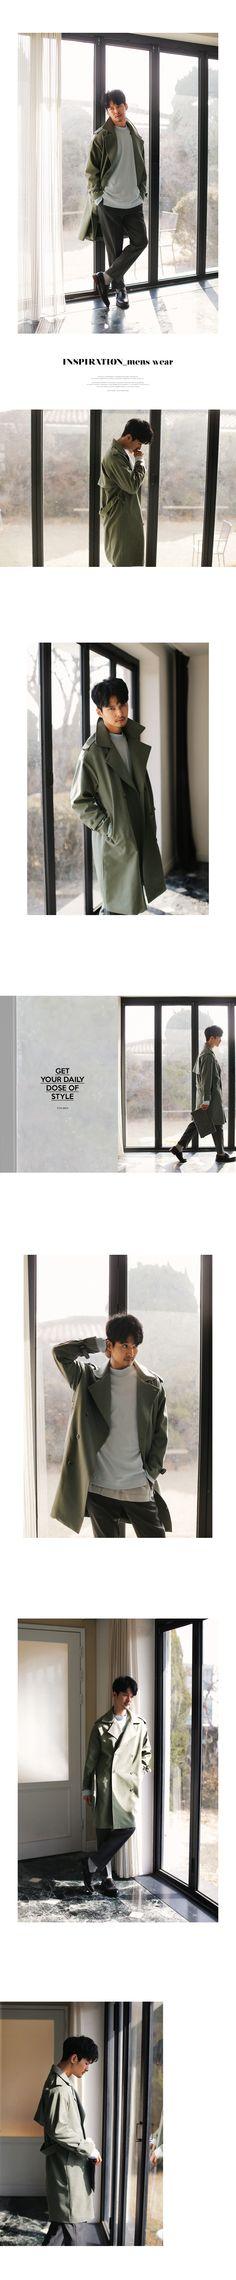 2COLORSベーシックトレンチコート・全2色アウターコート|レディースファッション通販 DHOLICディーホリック [ファストファッション 水着 ワンピース]